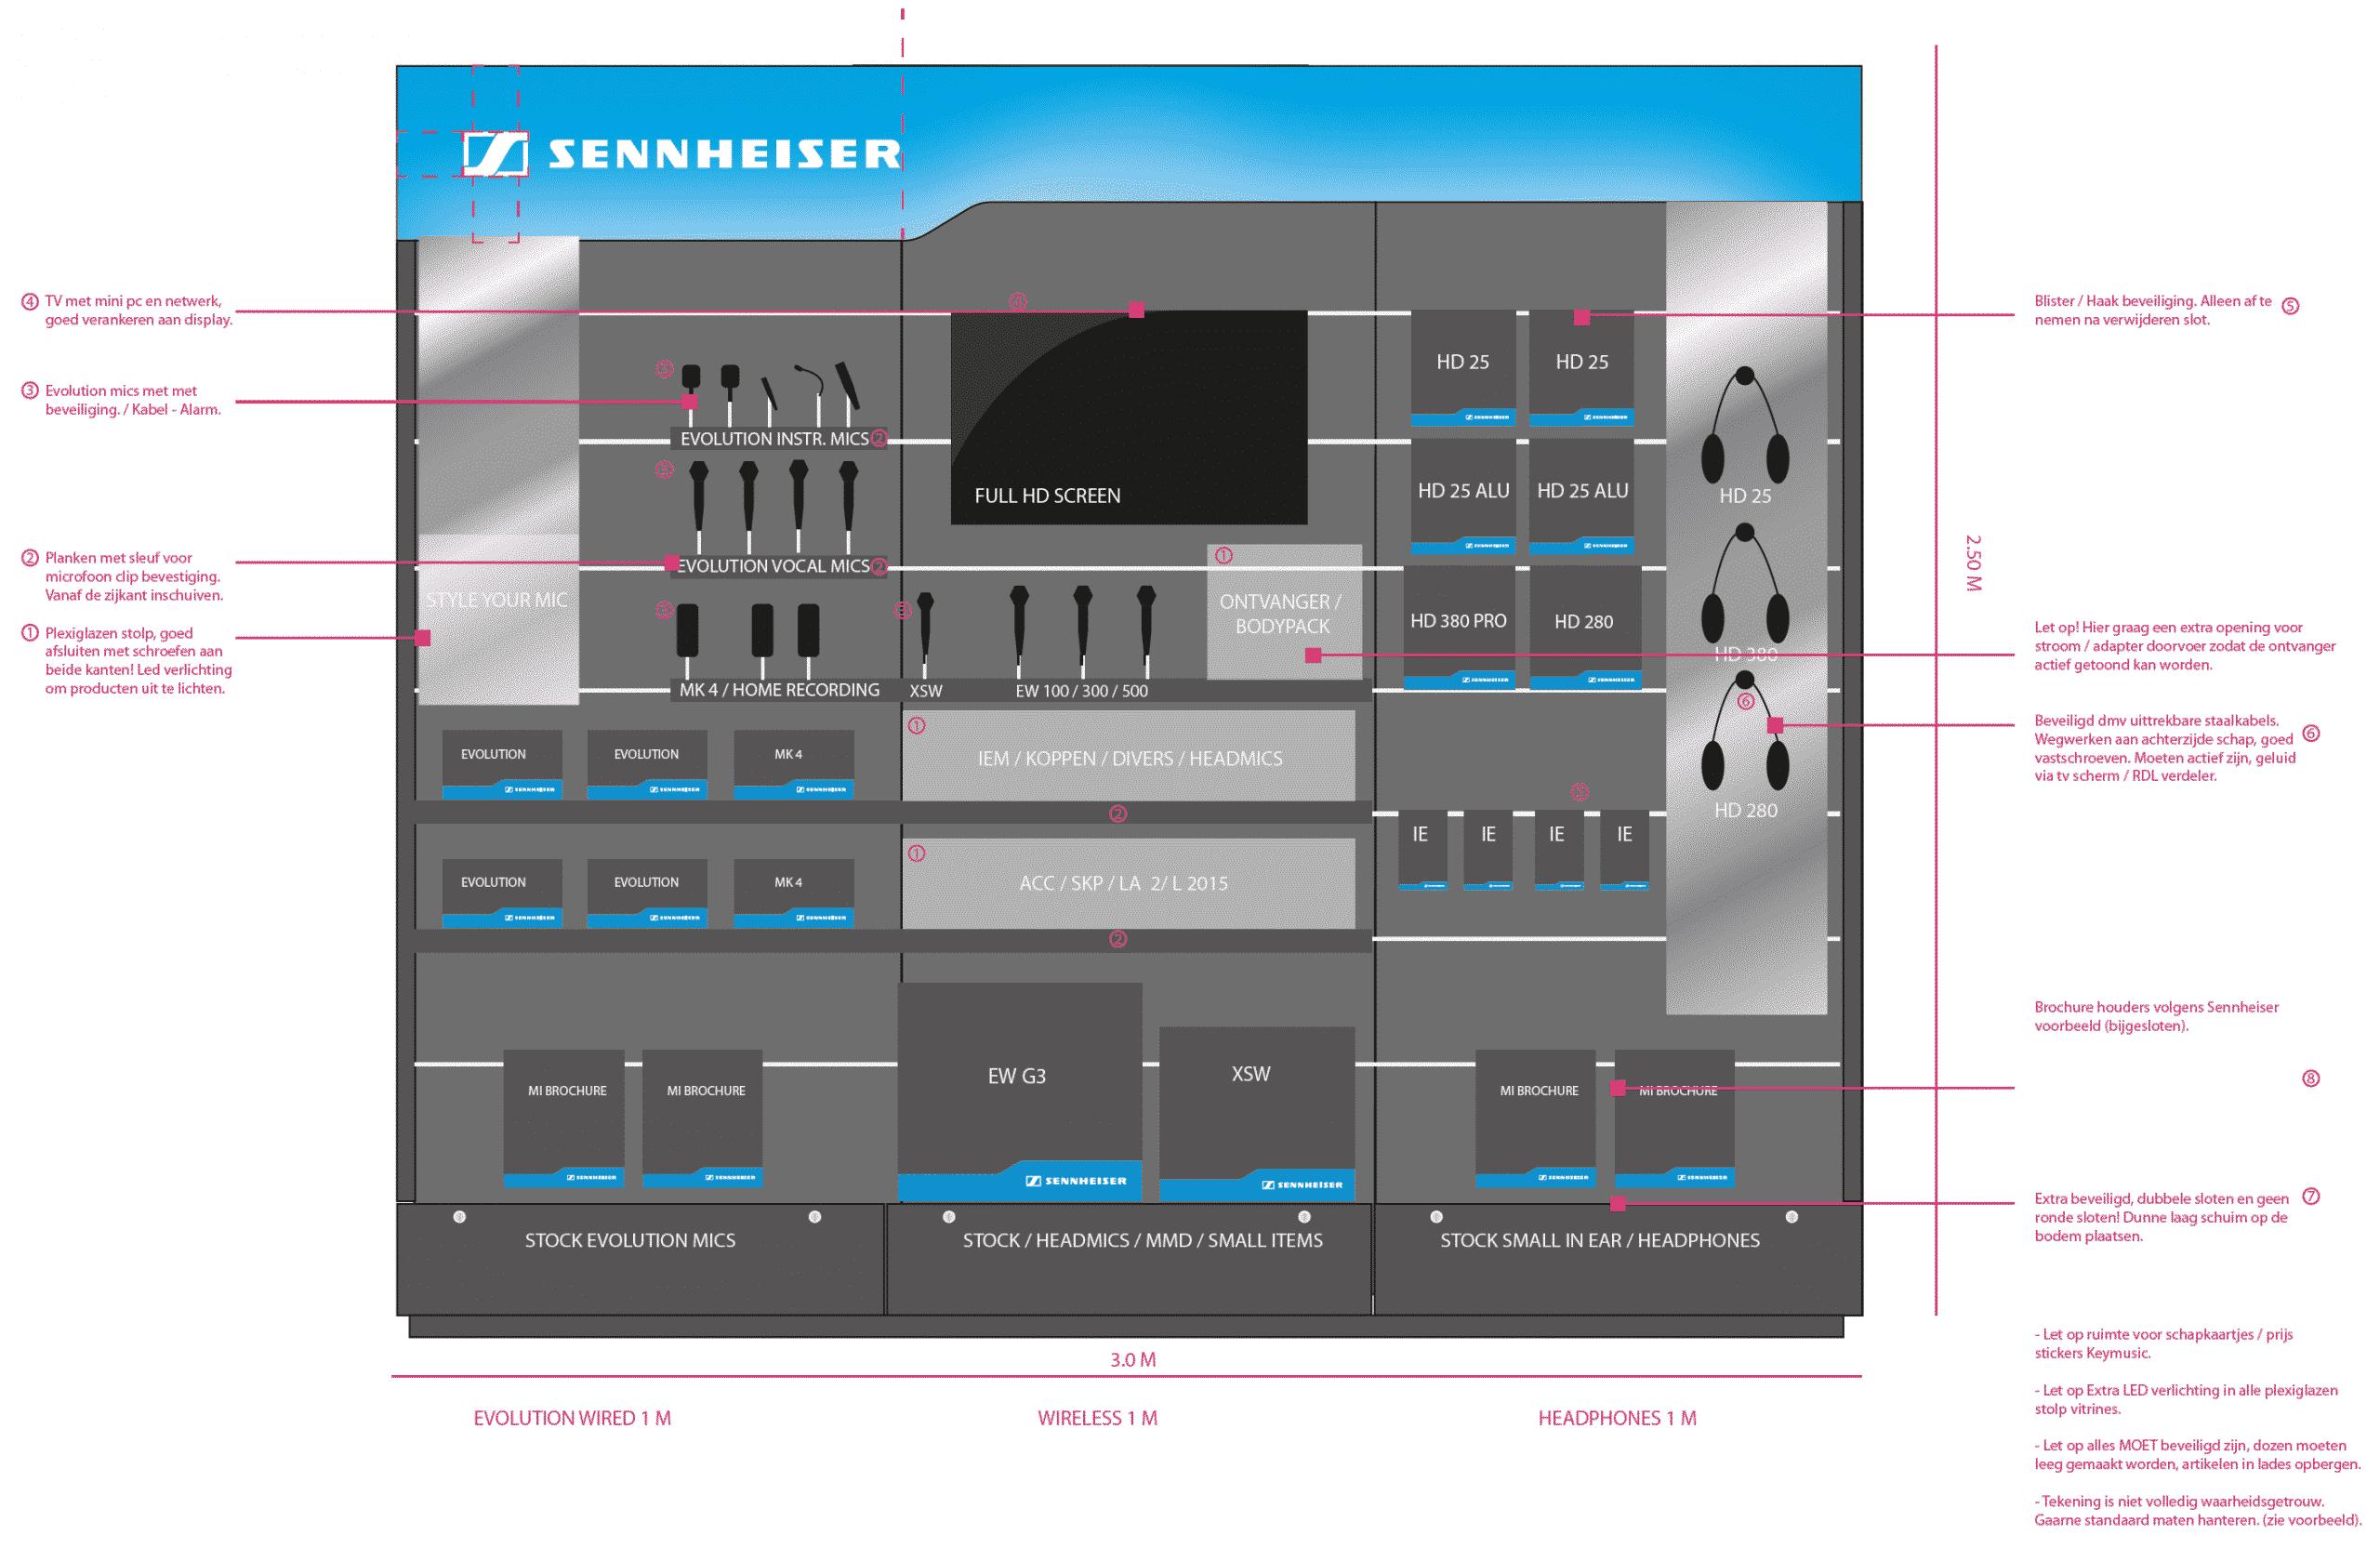 Sennheiser Shop in Shop concept